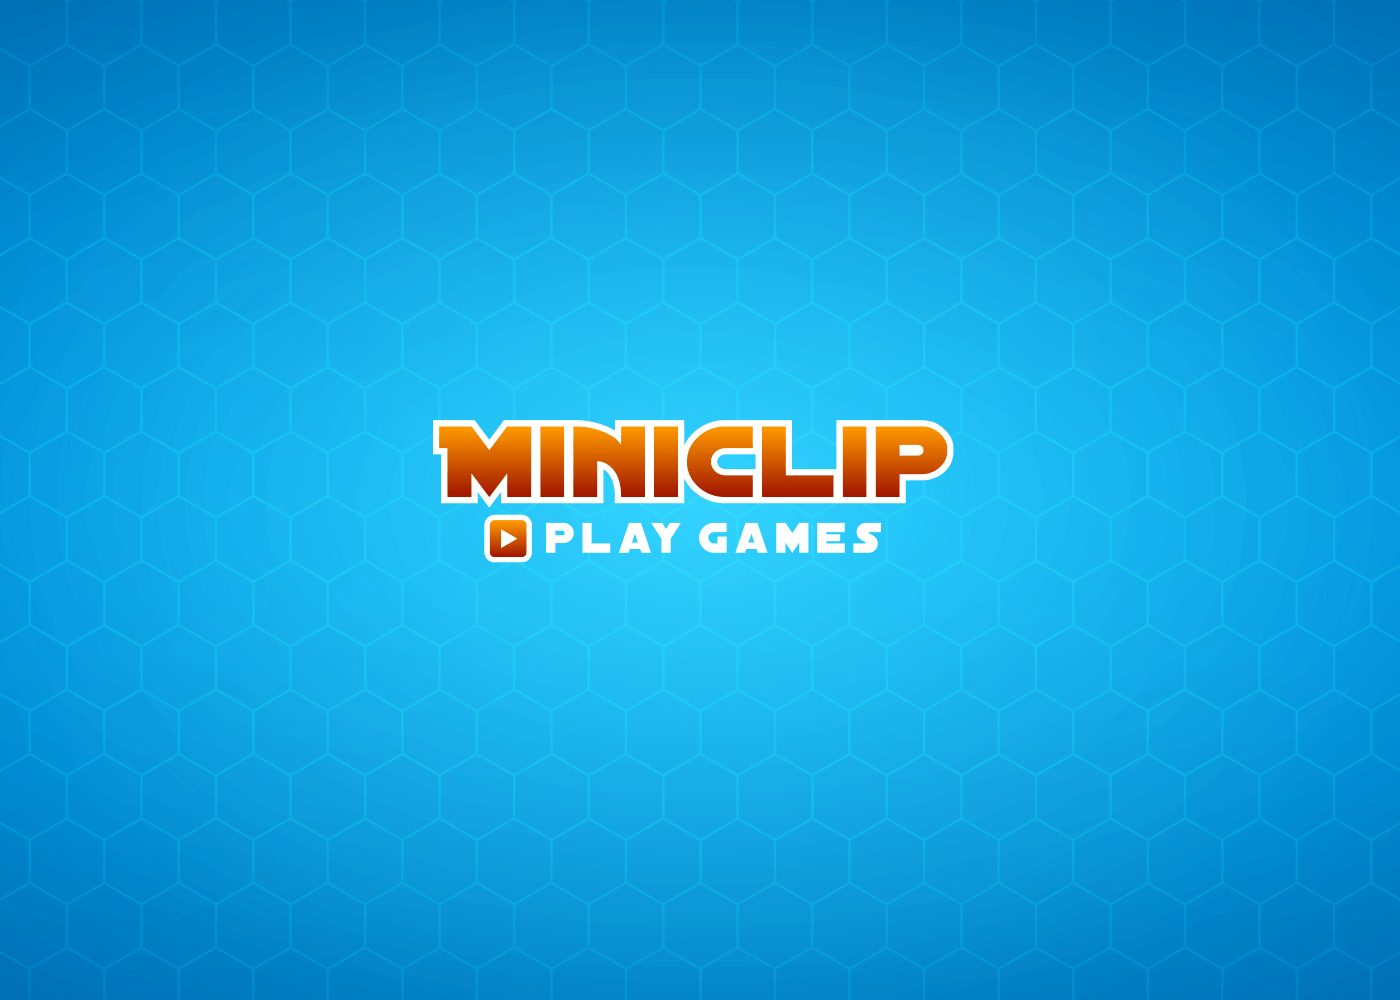 Miniclip dating